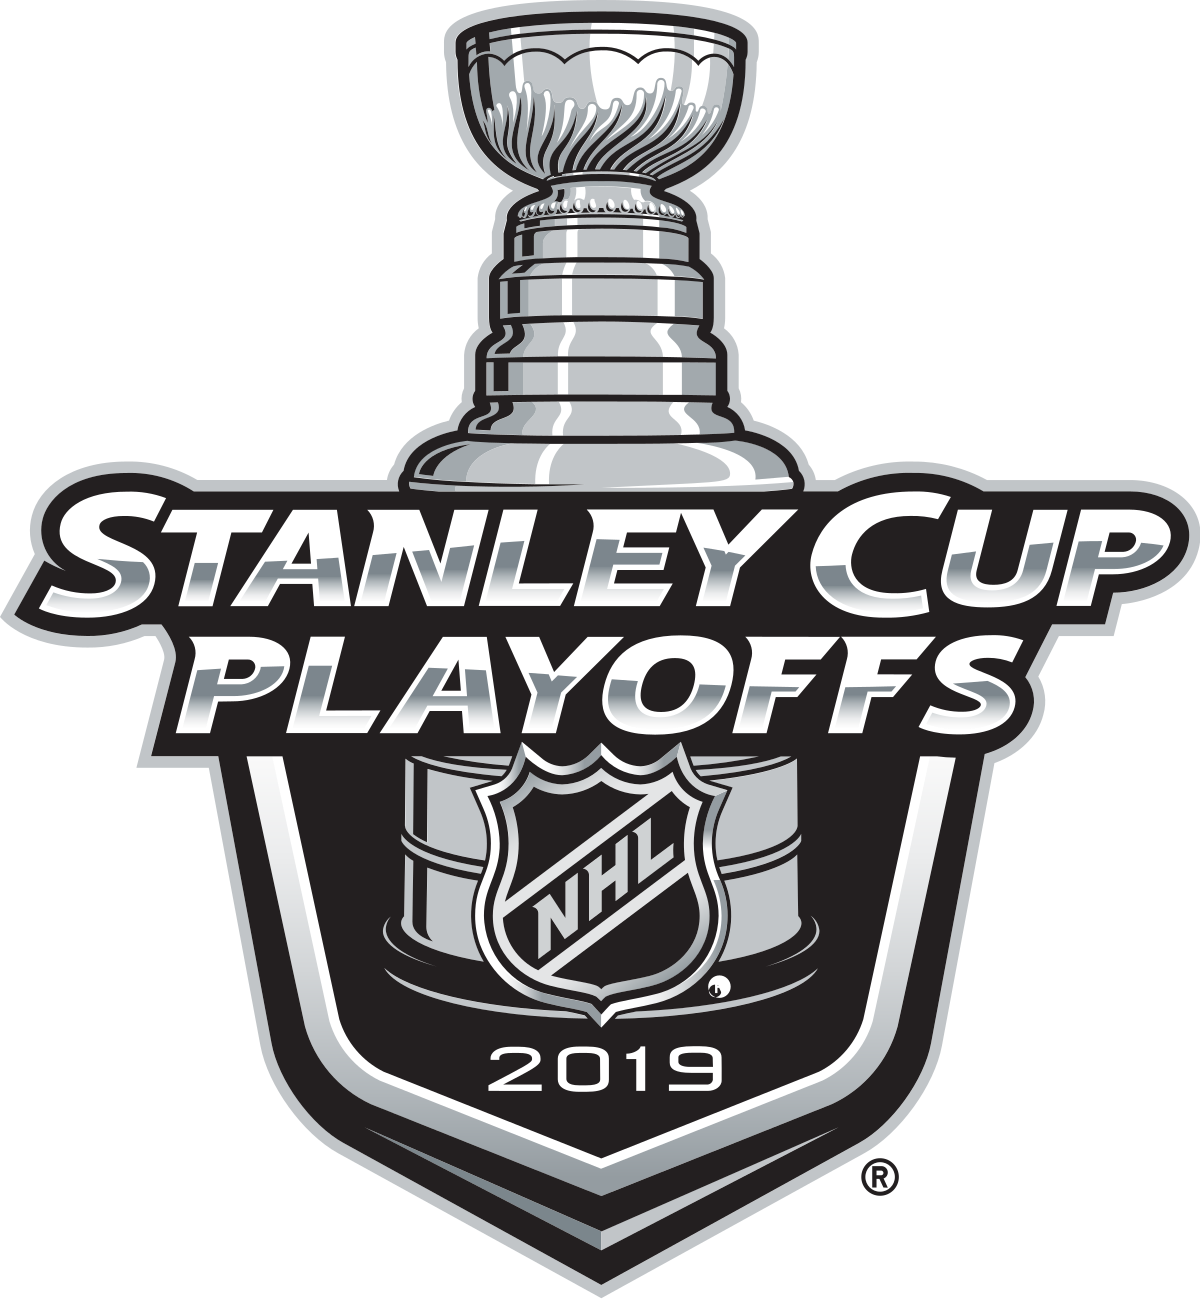 2019 Stanley Cup playoffs   Wikipedia 1200x1297